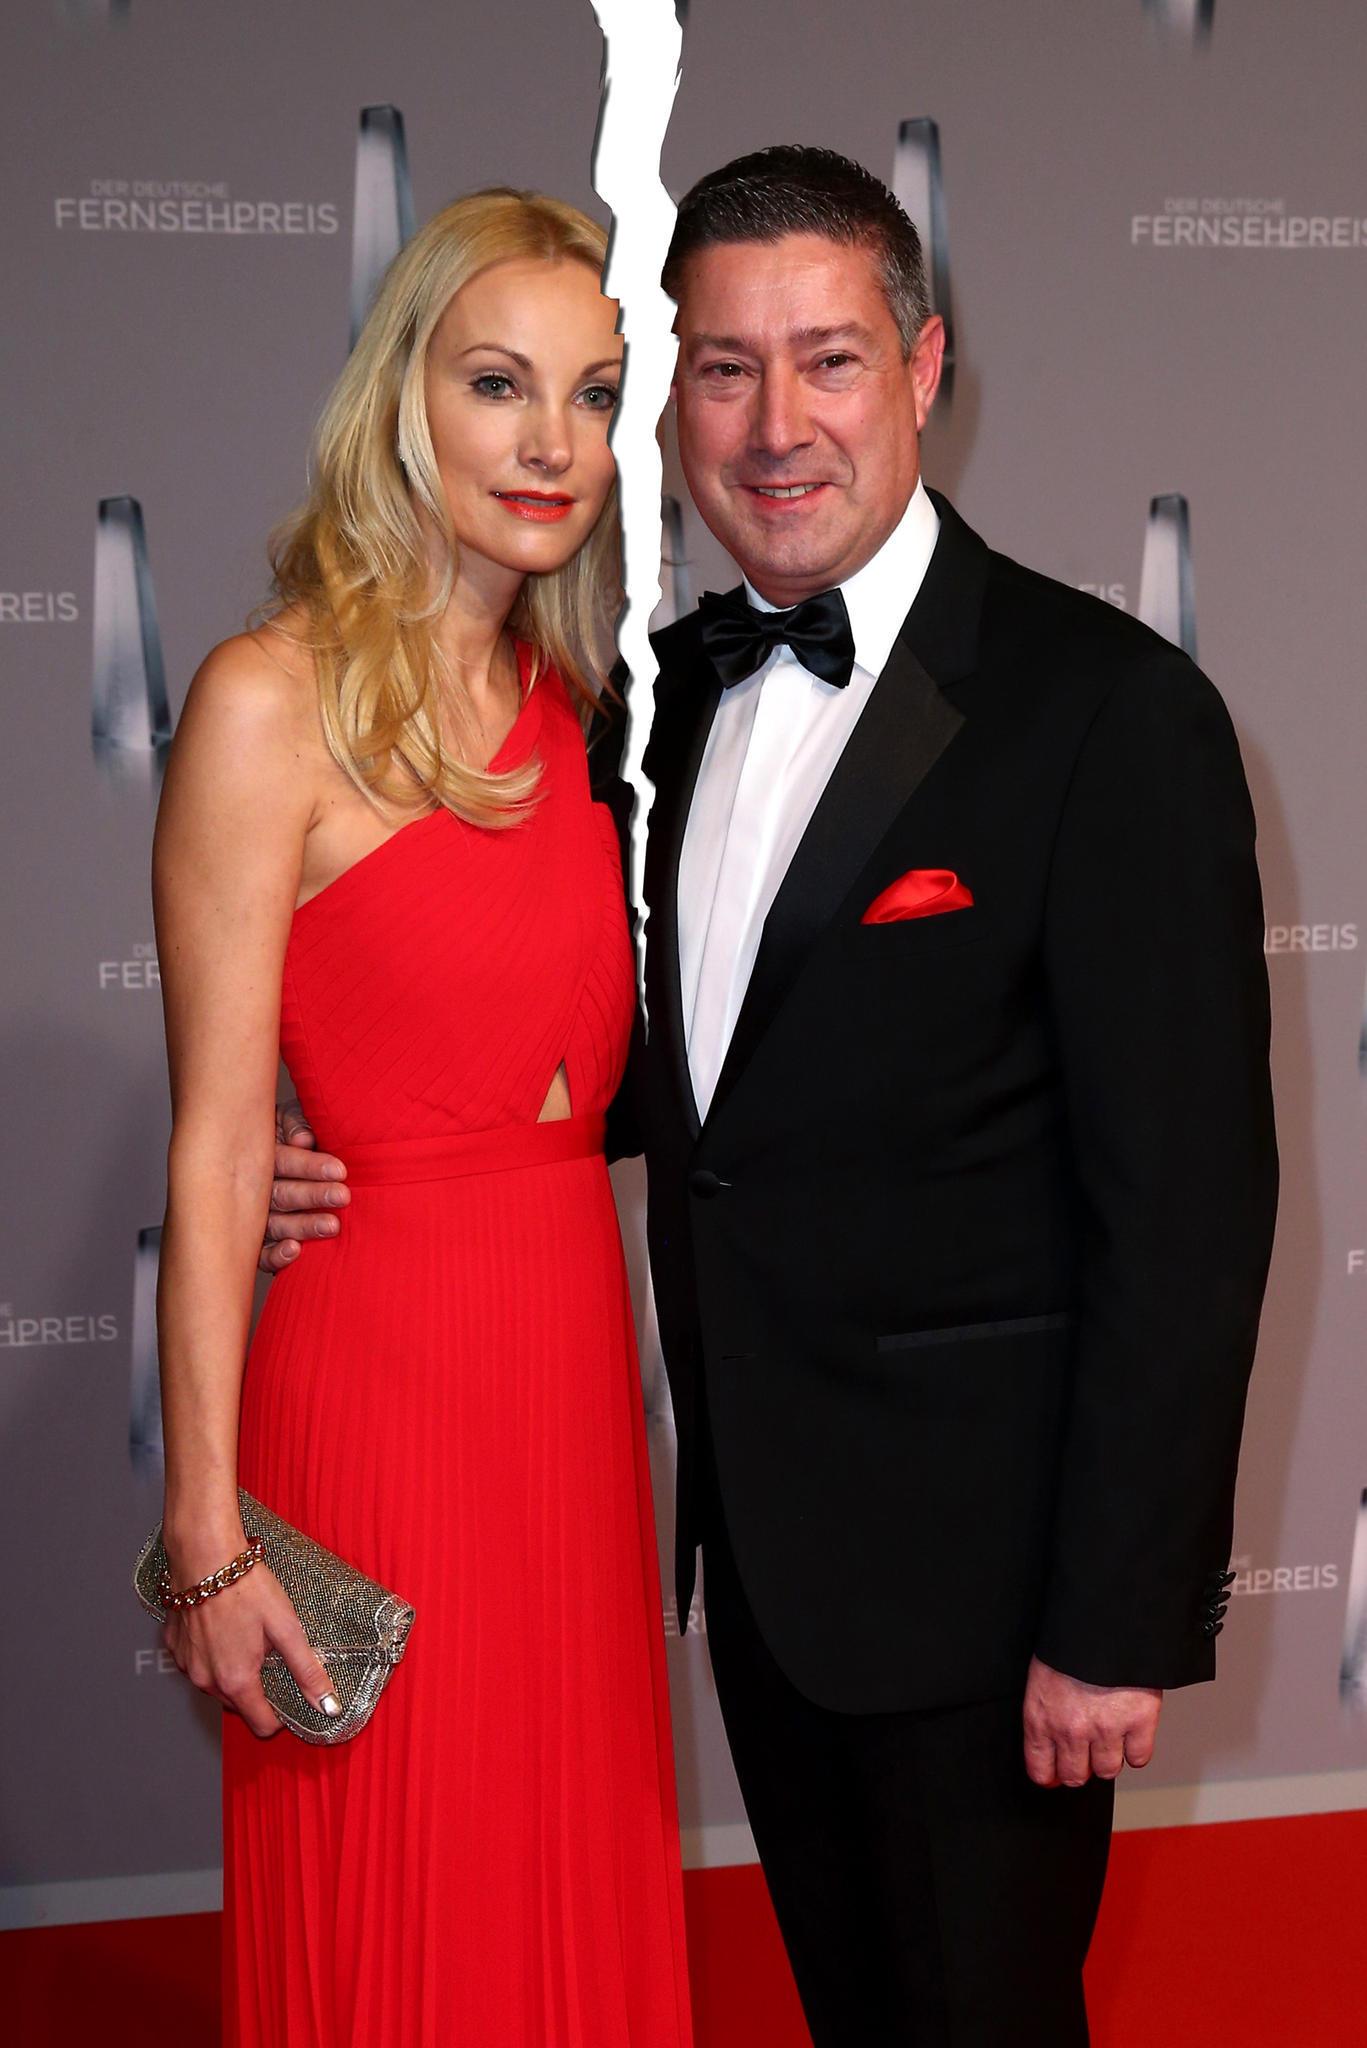 Joachi Llambi und seine Noch-Ehefrau Ilona